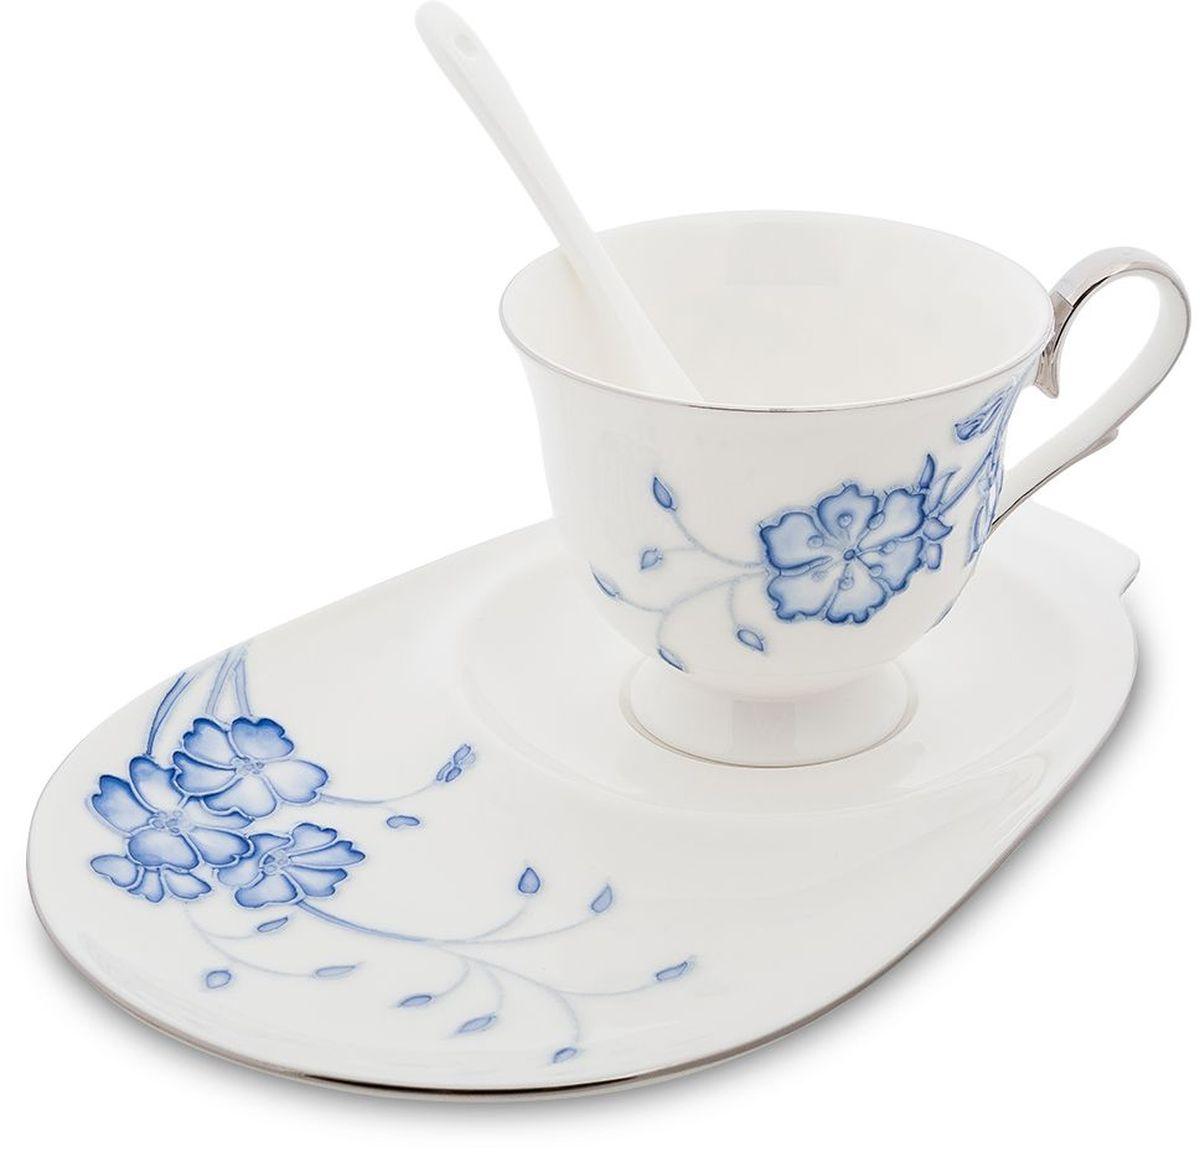 Чайная пара Pavone Голубая бабочка, 3 предмета. 45160654 009312Объем чашки: 250 мл Длина блюдца: 23 см